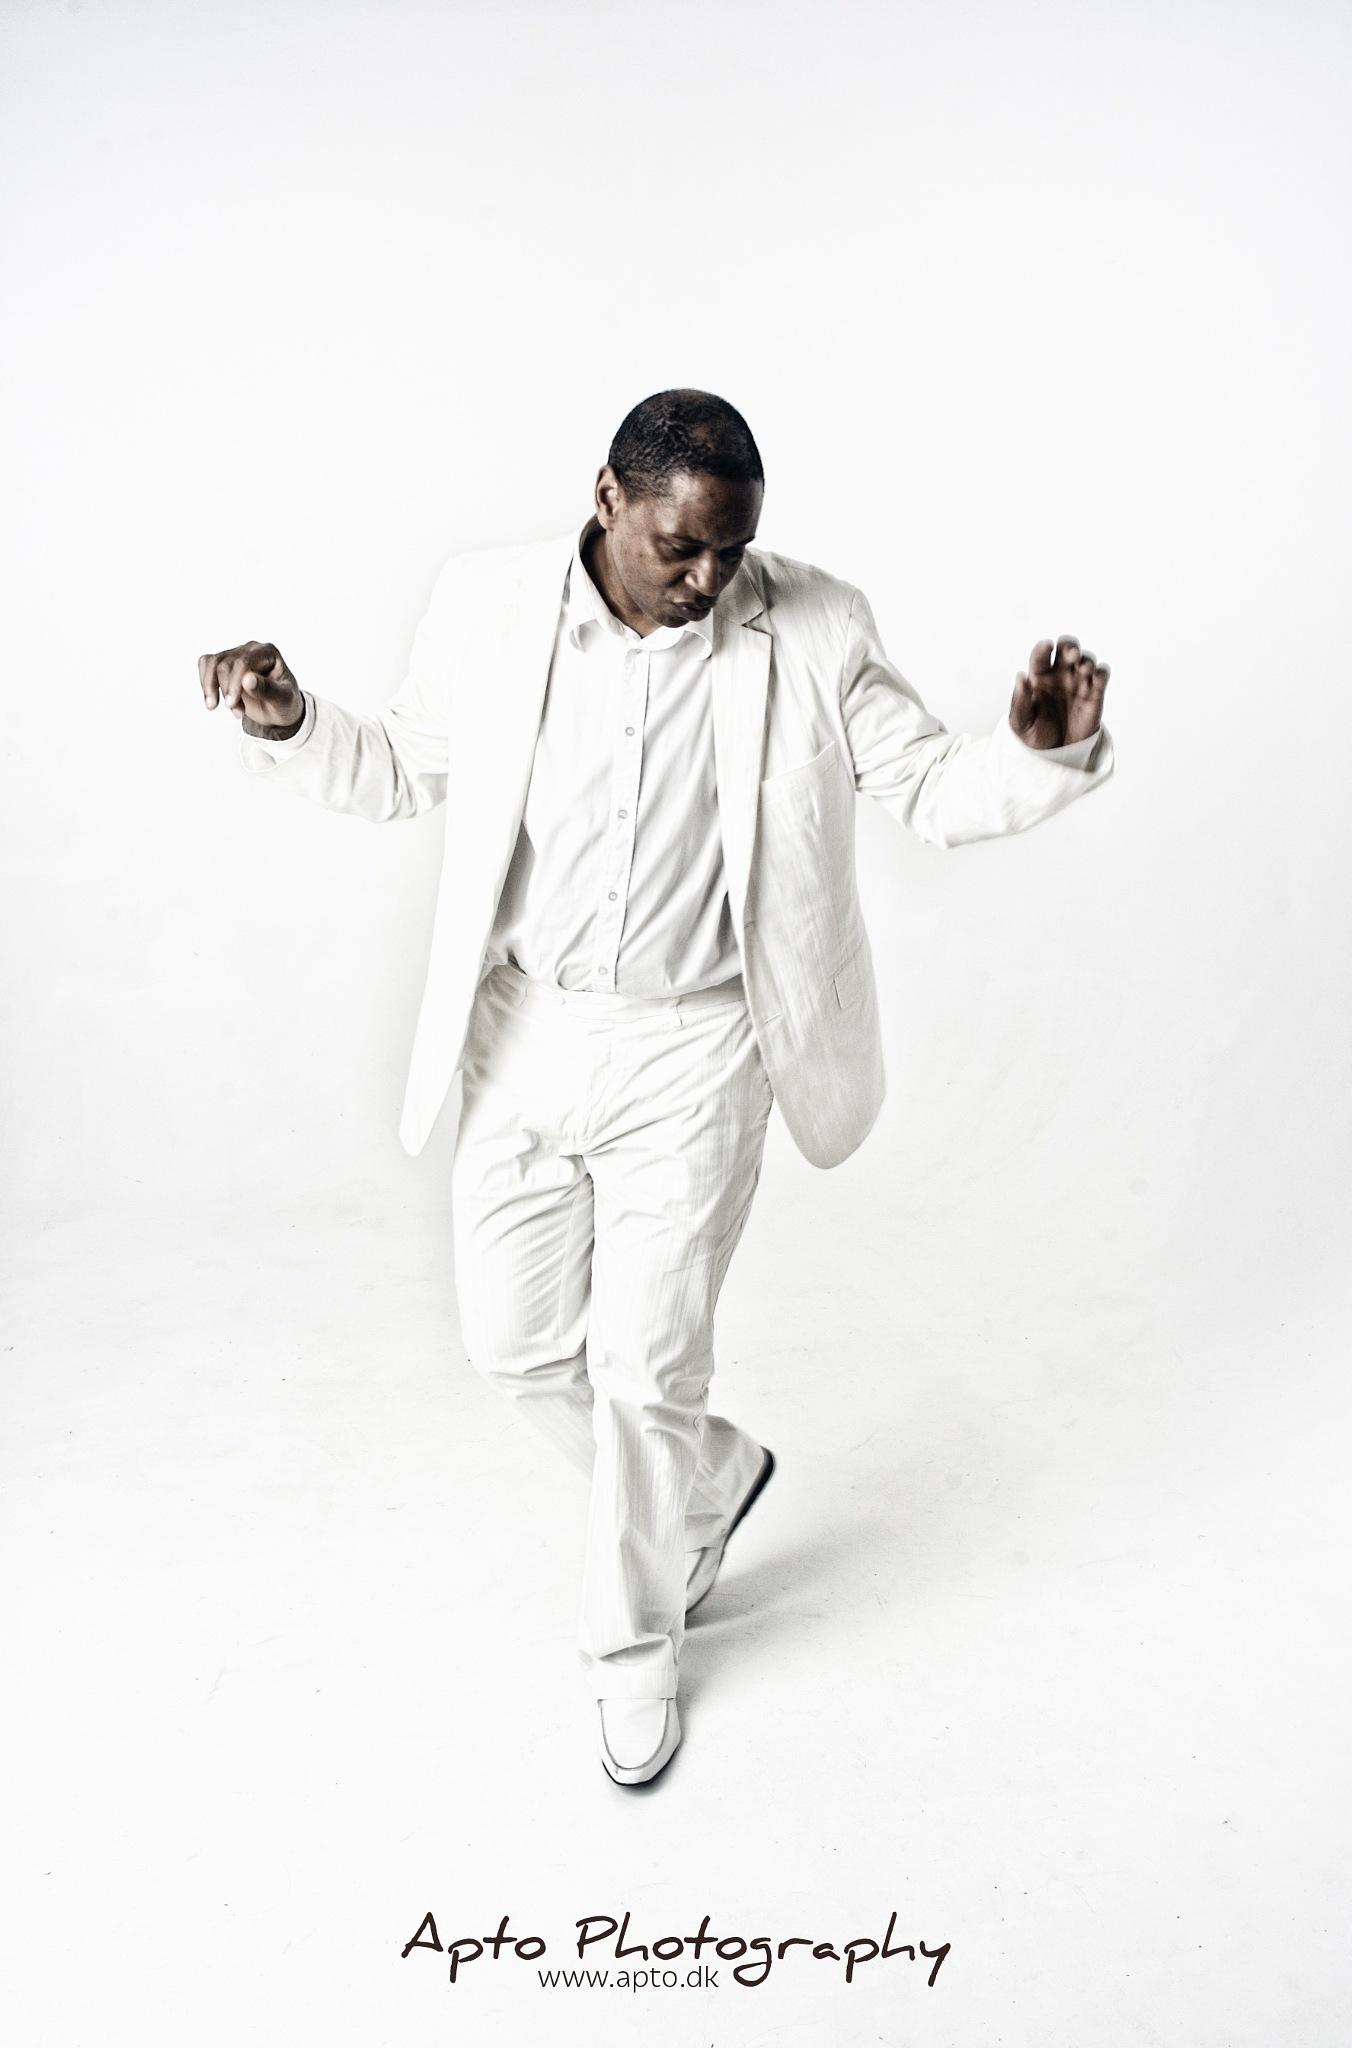 Dancer by Michael Sørensen